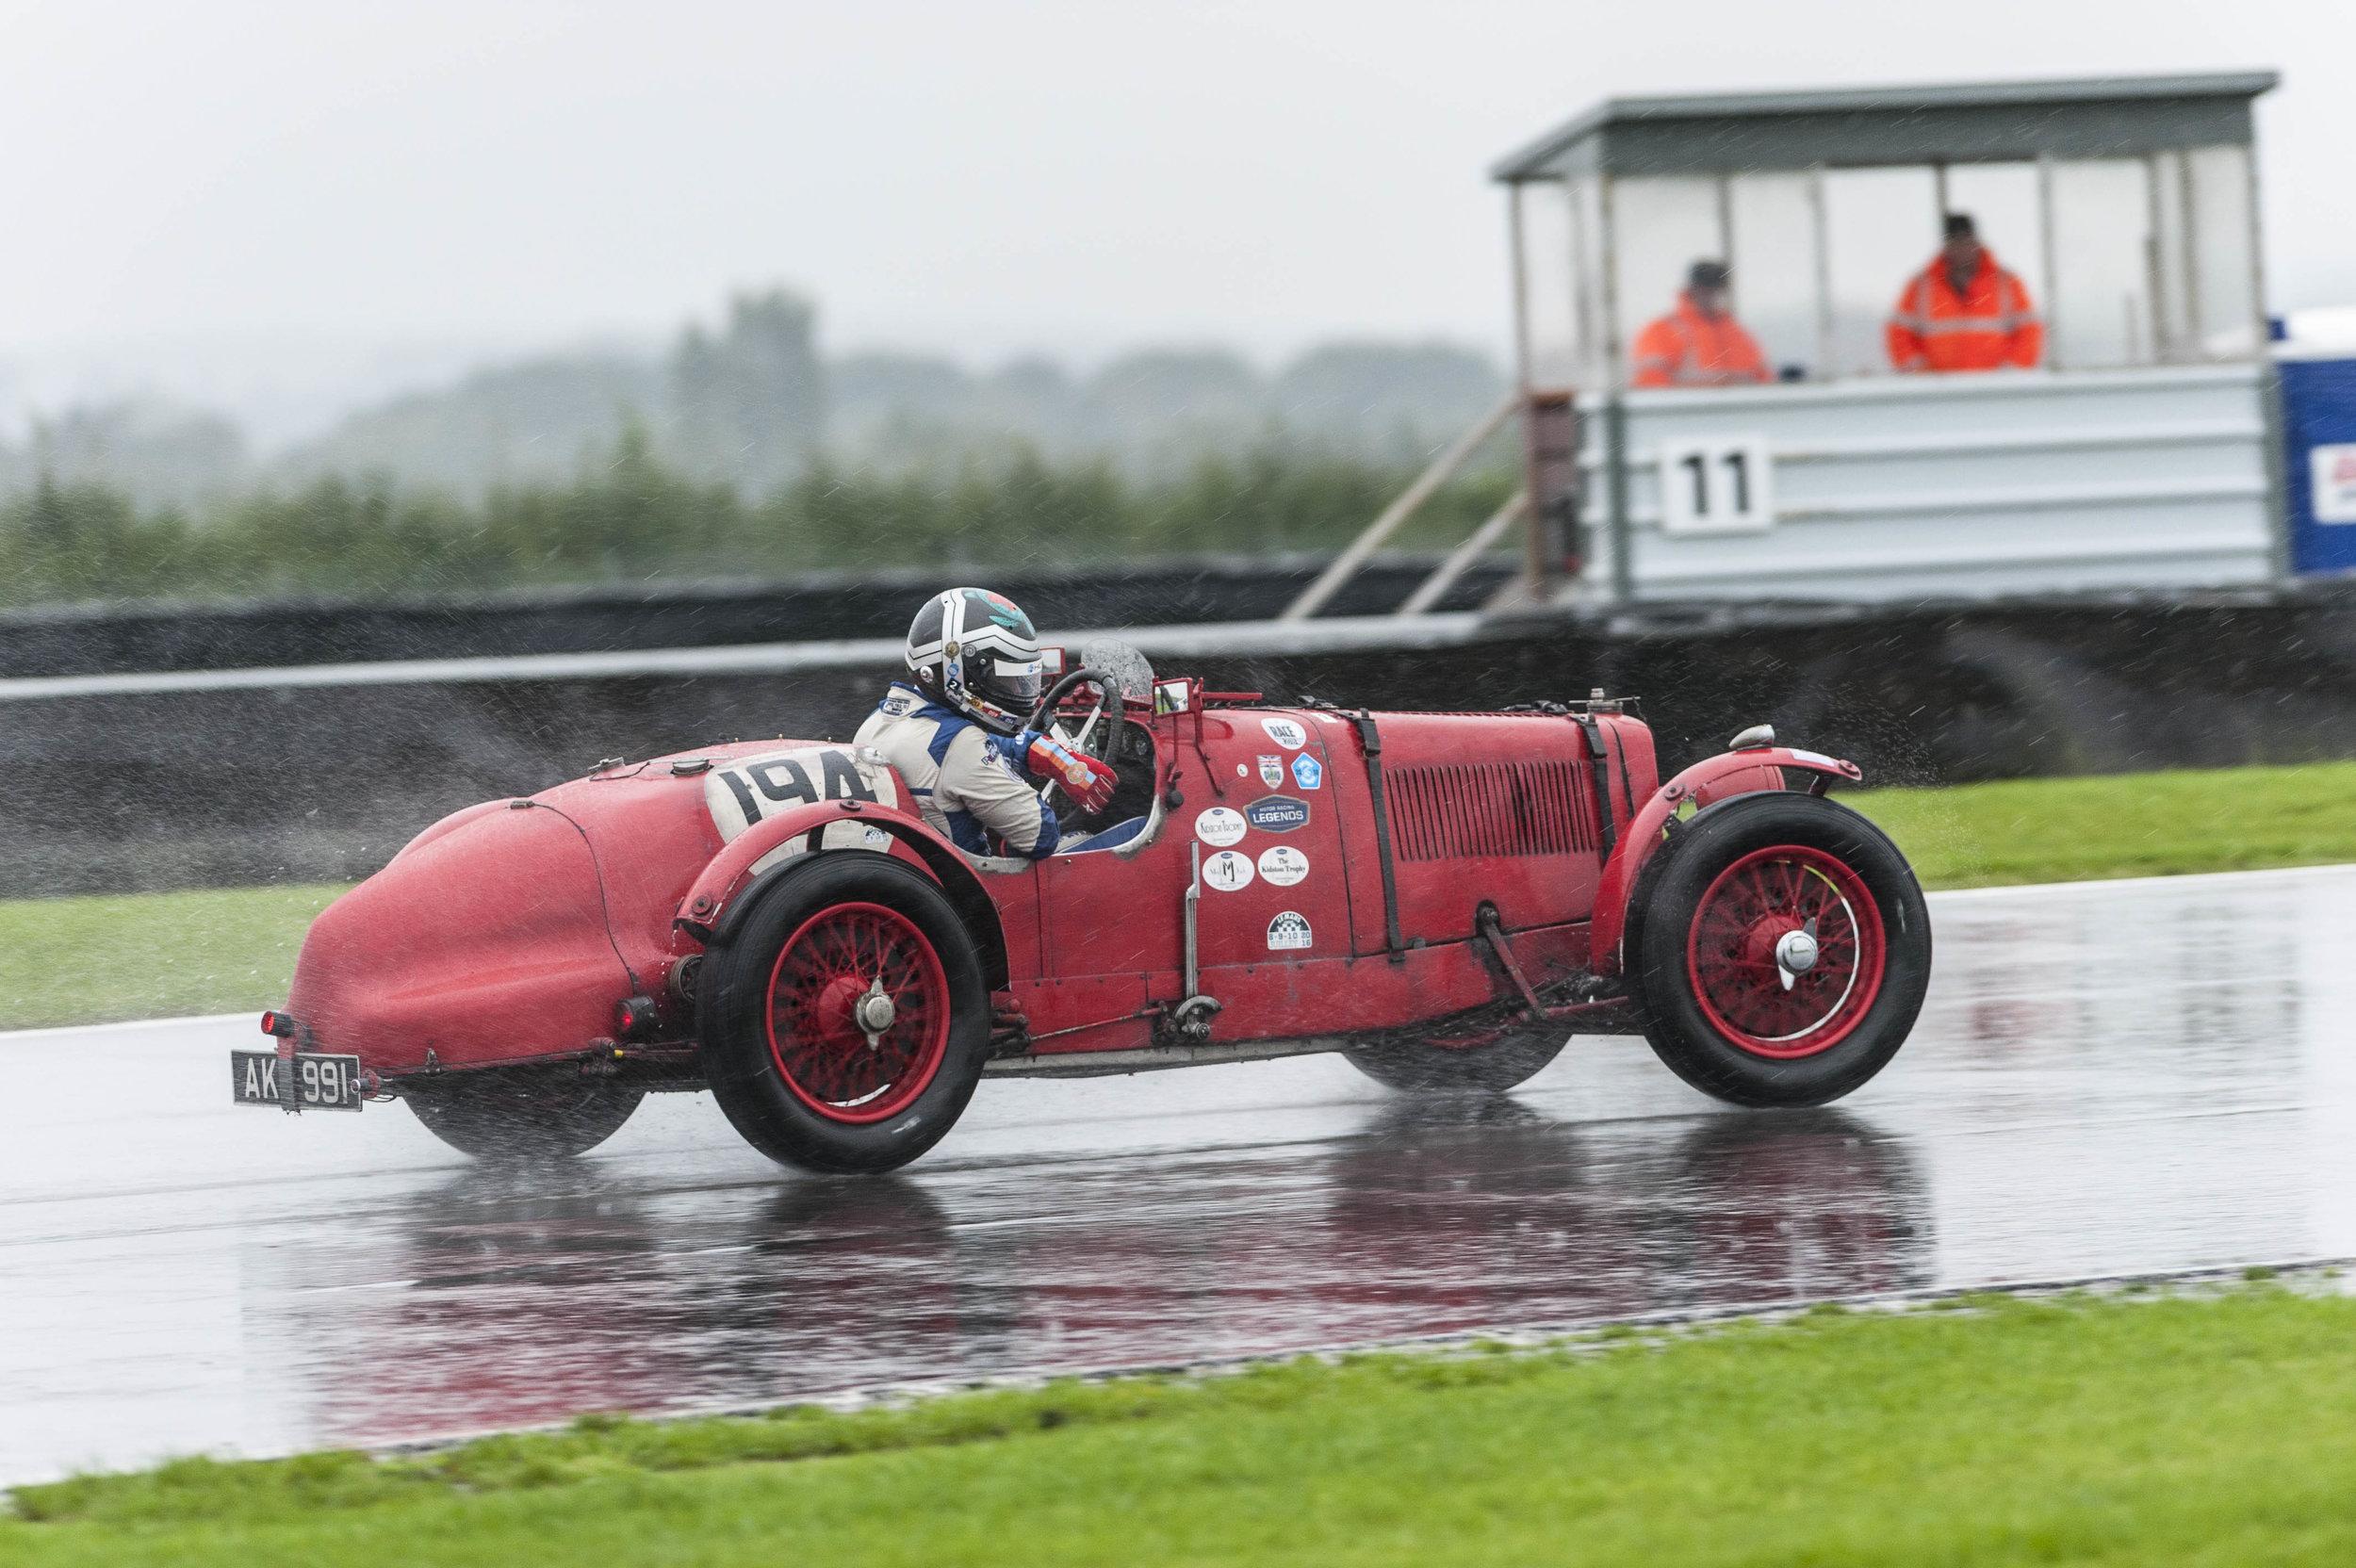 Richard Bradley applying opposite lock in the wet conditions:  Peter McFadyen